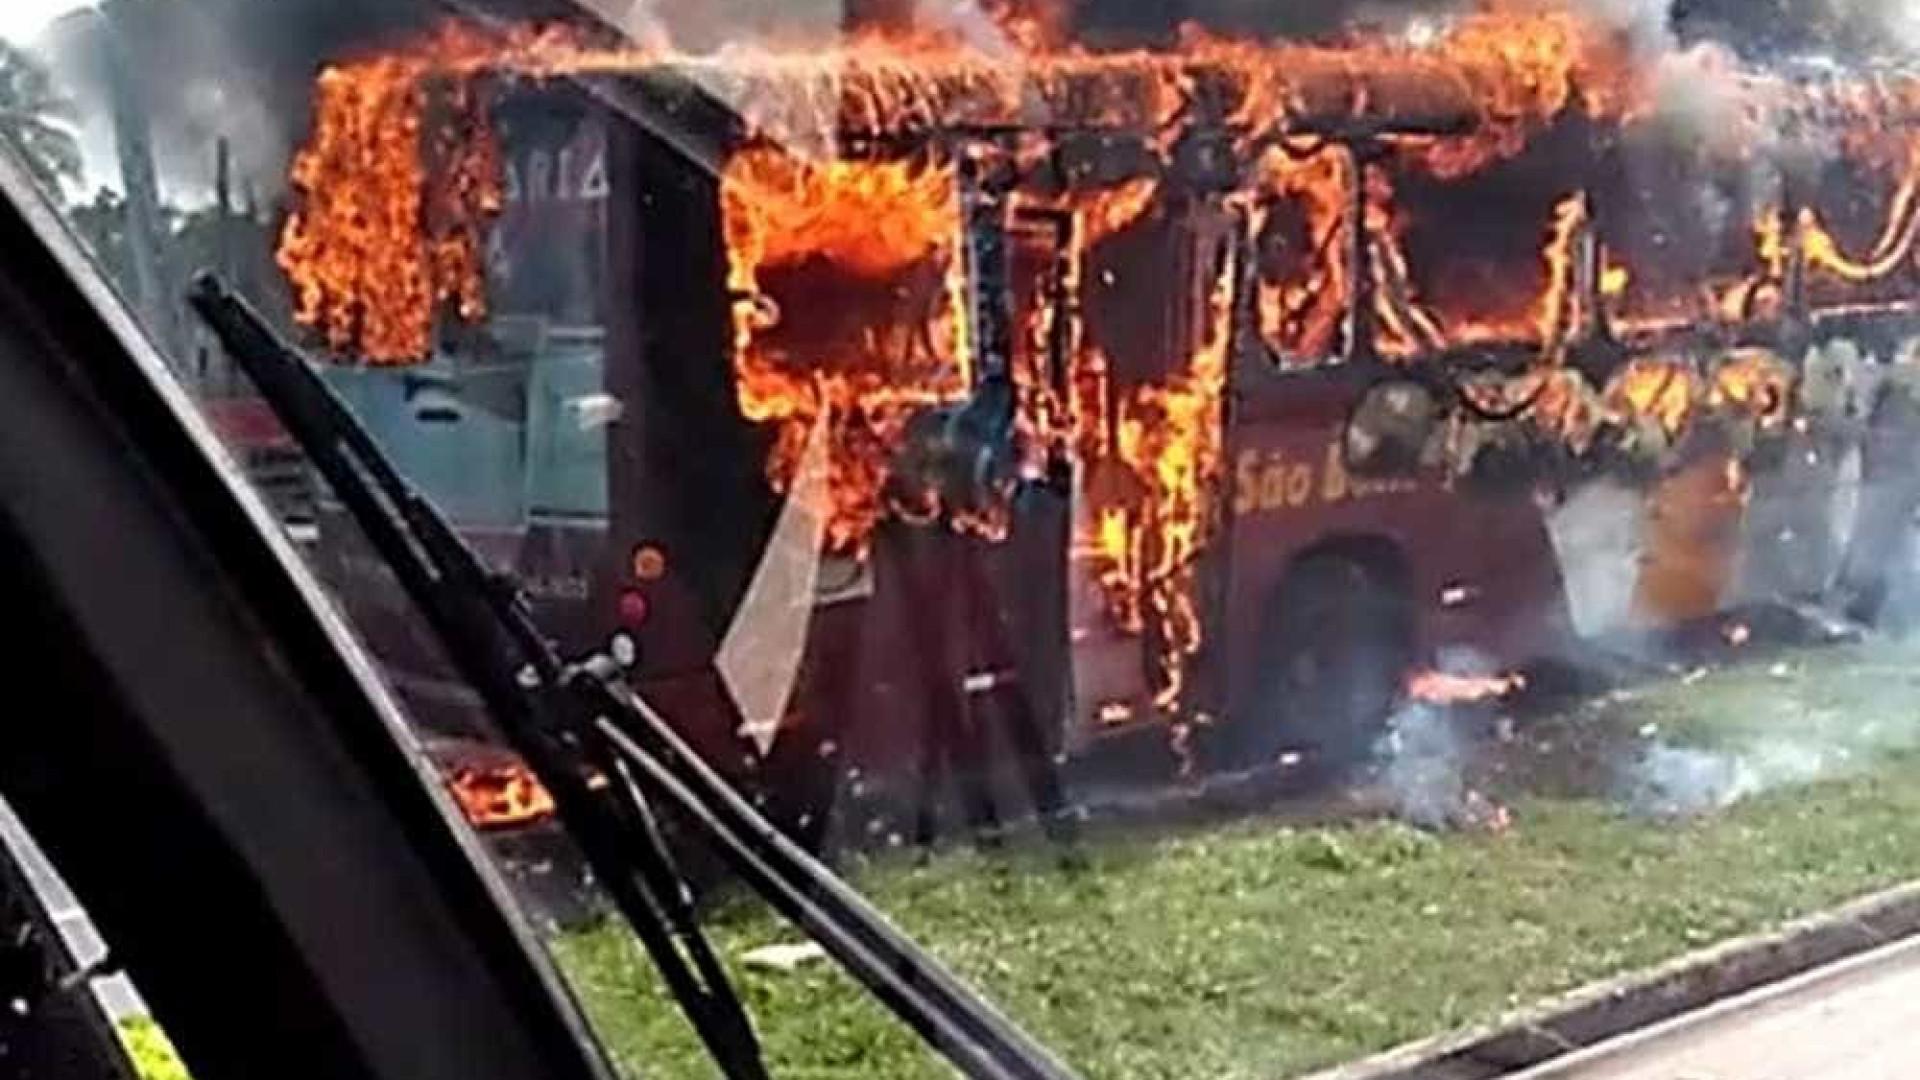 Polícia apreende explosivos próximo a  empresa de ônibus